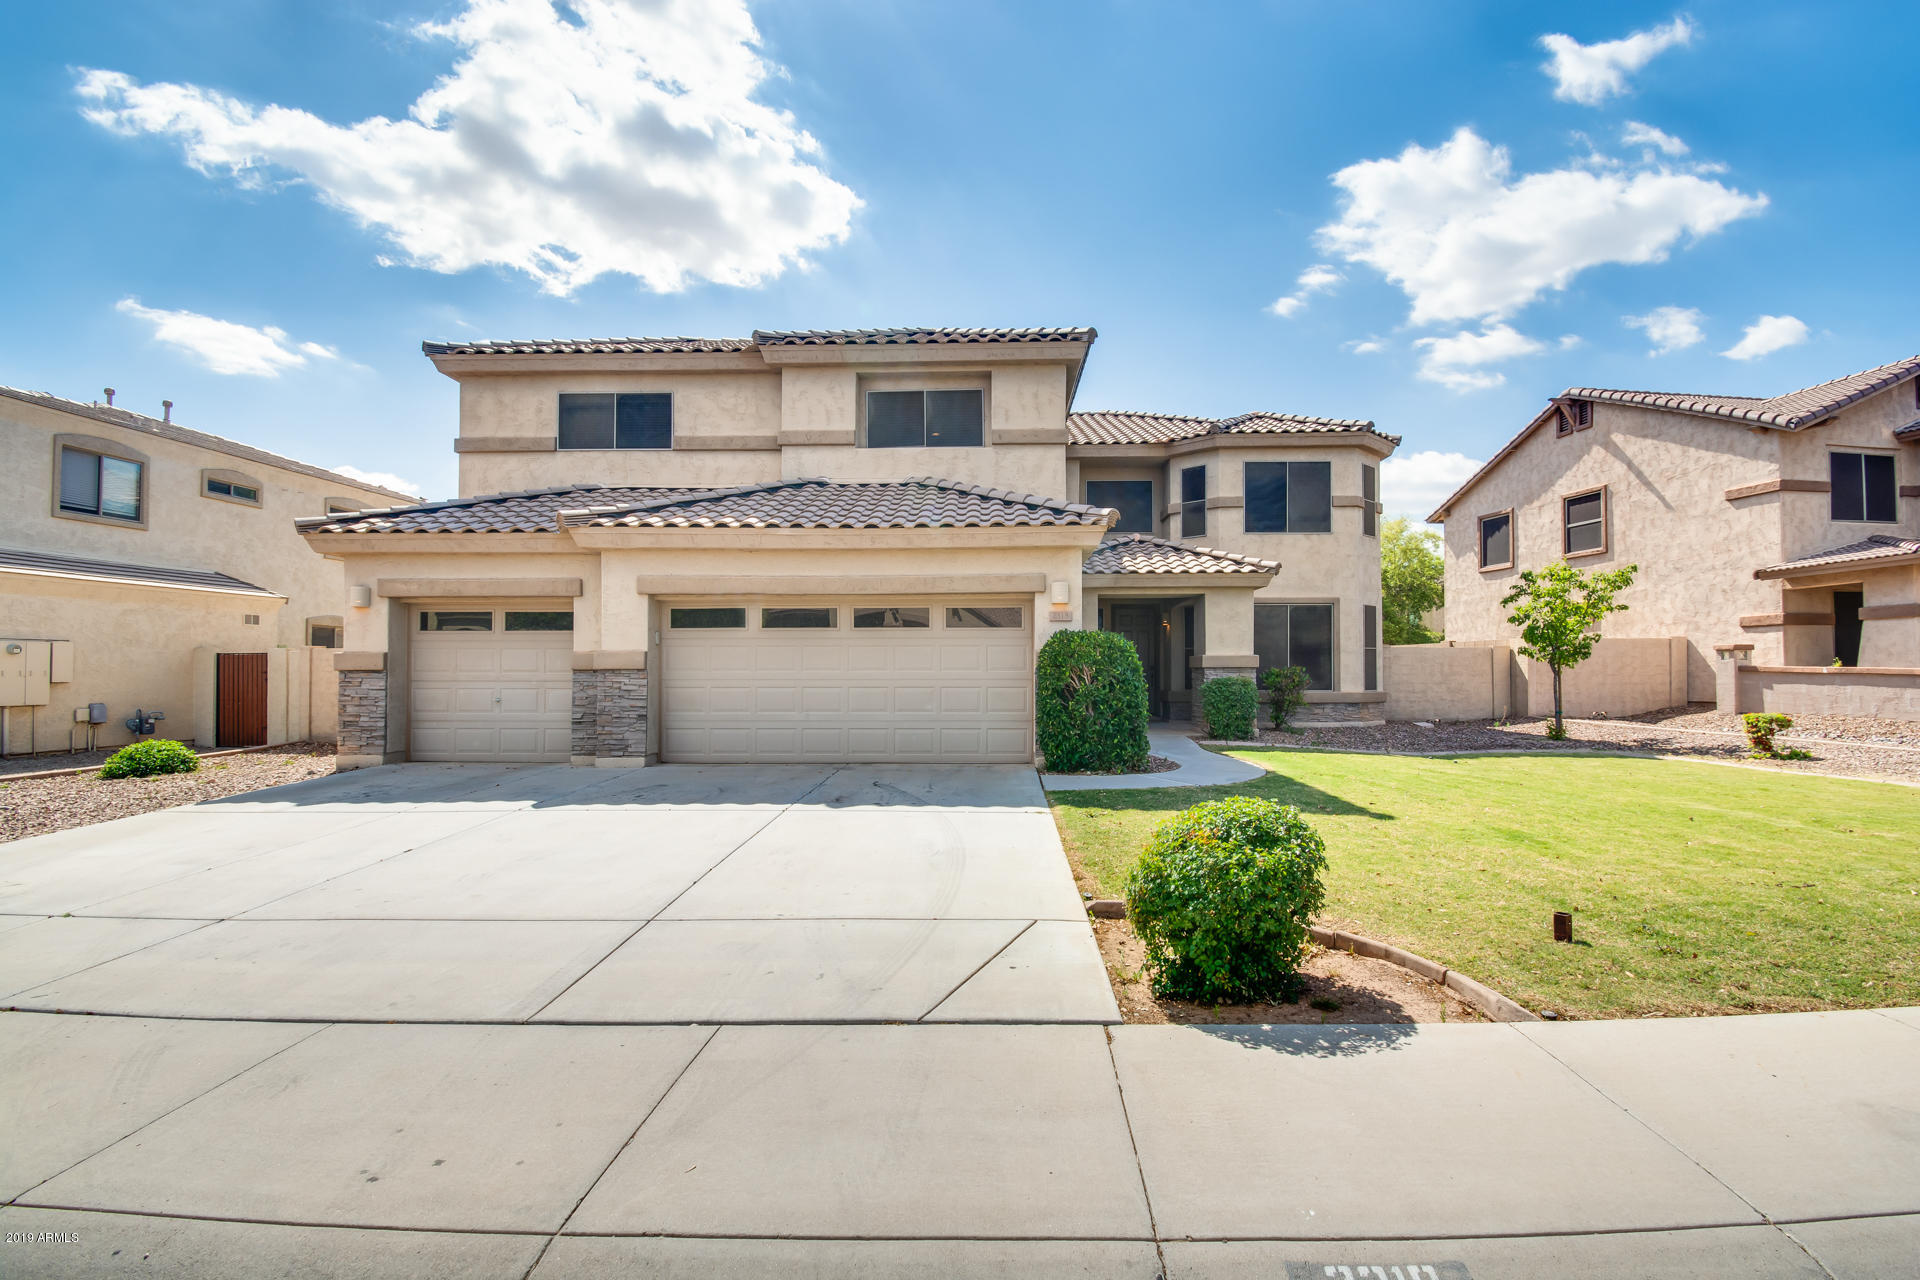 Photo of 2318 S CANFIELD Street, Mesa, AZ 85209